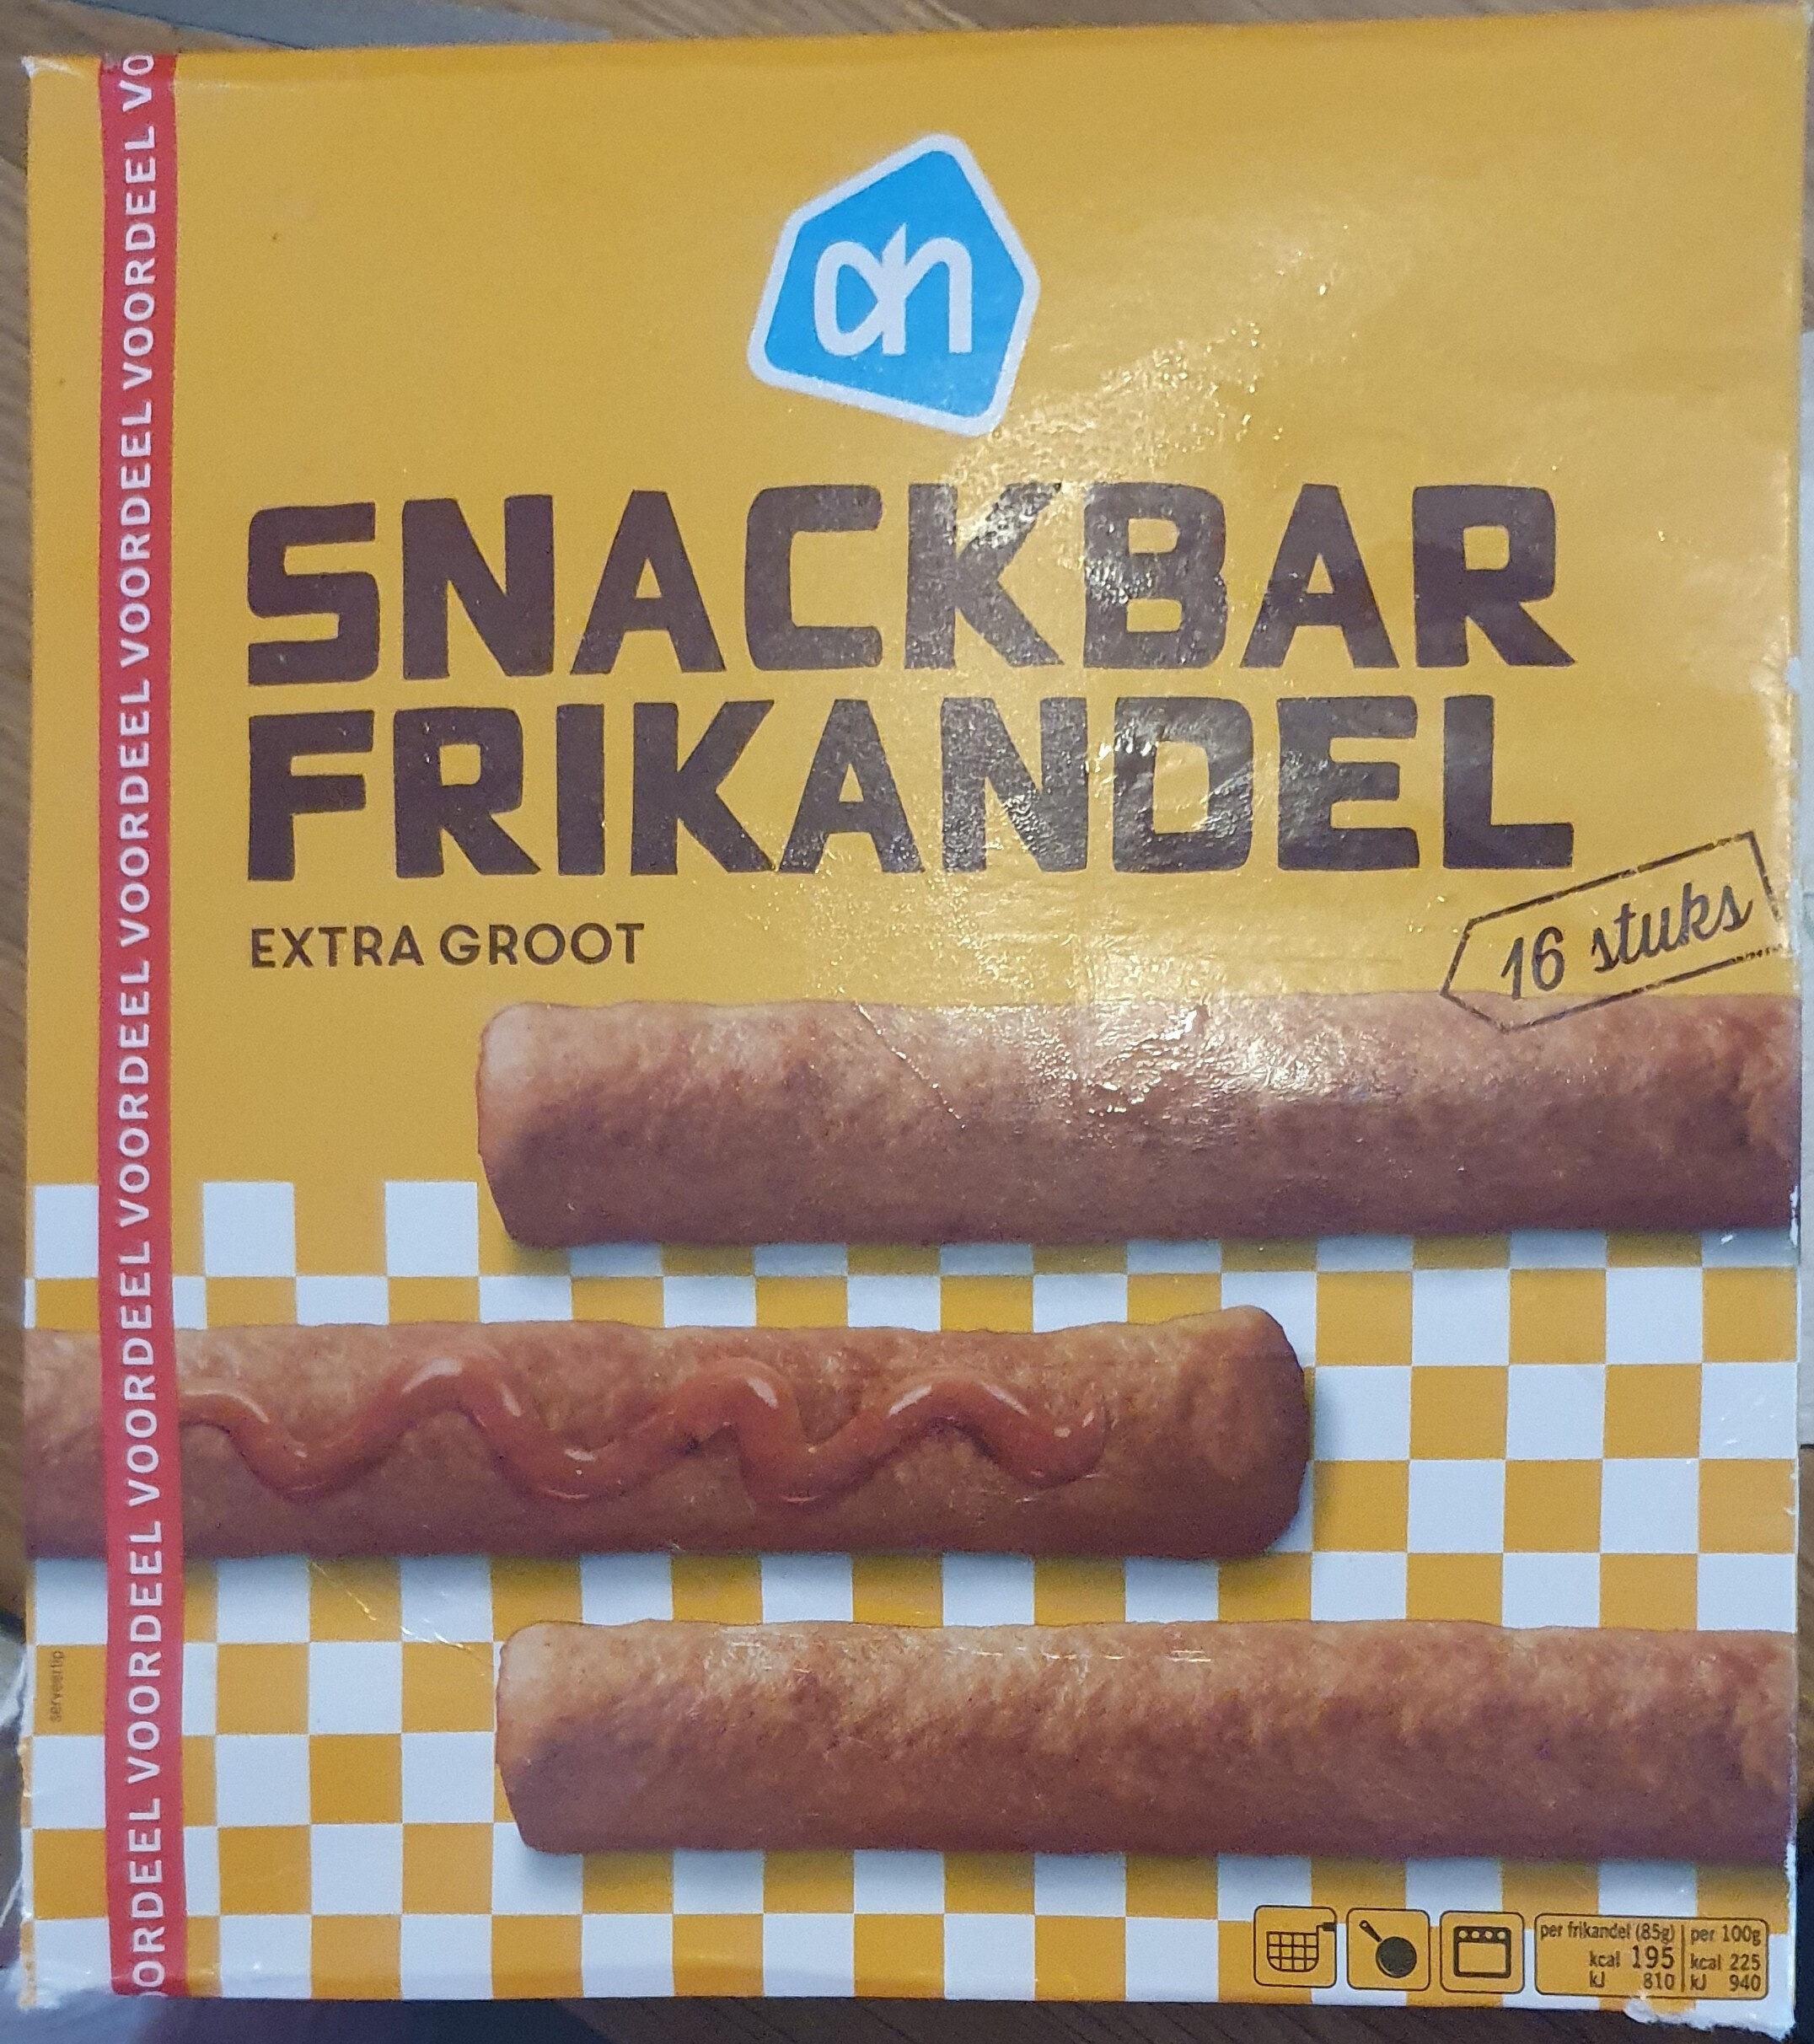 Snackbar Frikandel, extra groot - Produit - nl